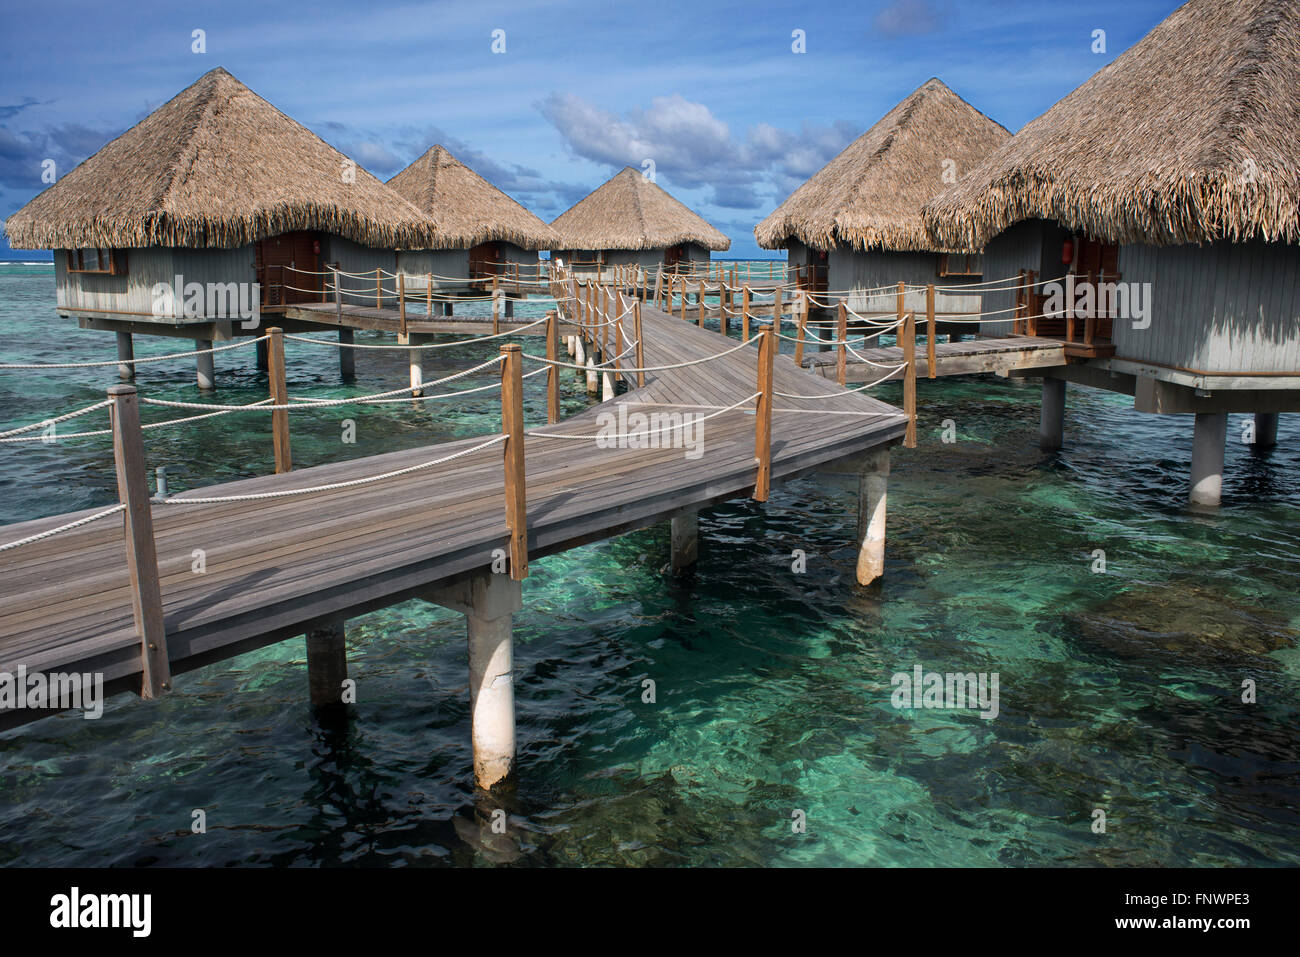 Meridien Hotel sull'isola di Tahiti, Polinesia Francese Tahiti Nui, Isole della Società, Polinesia francese, Immagini Stock